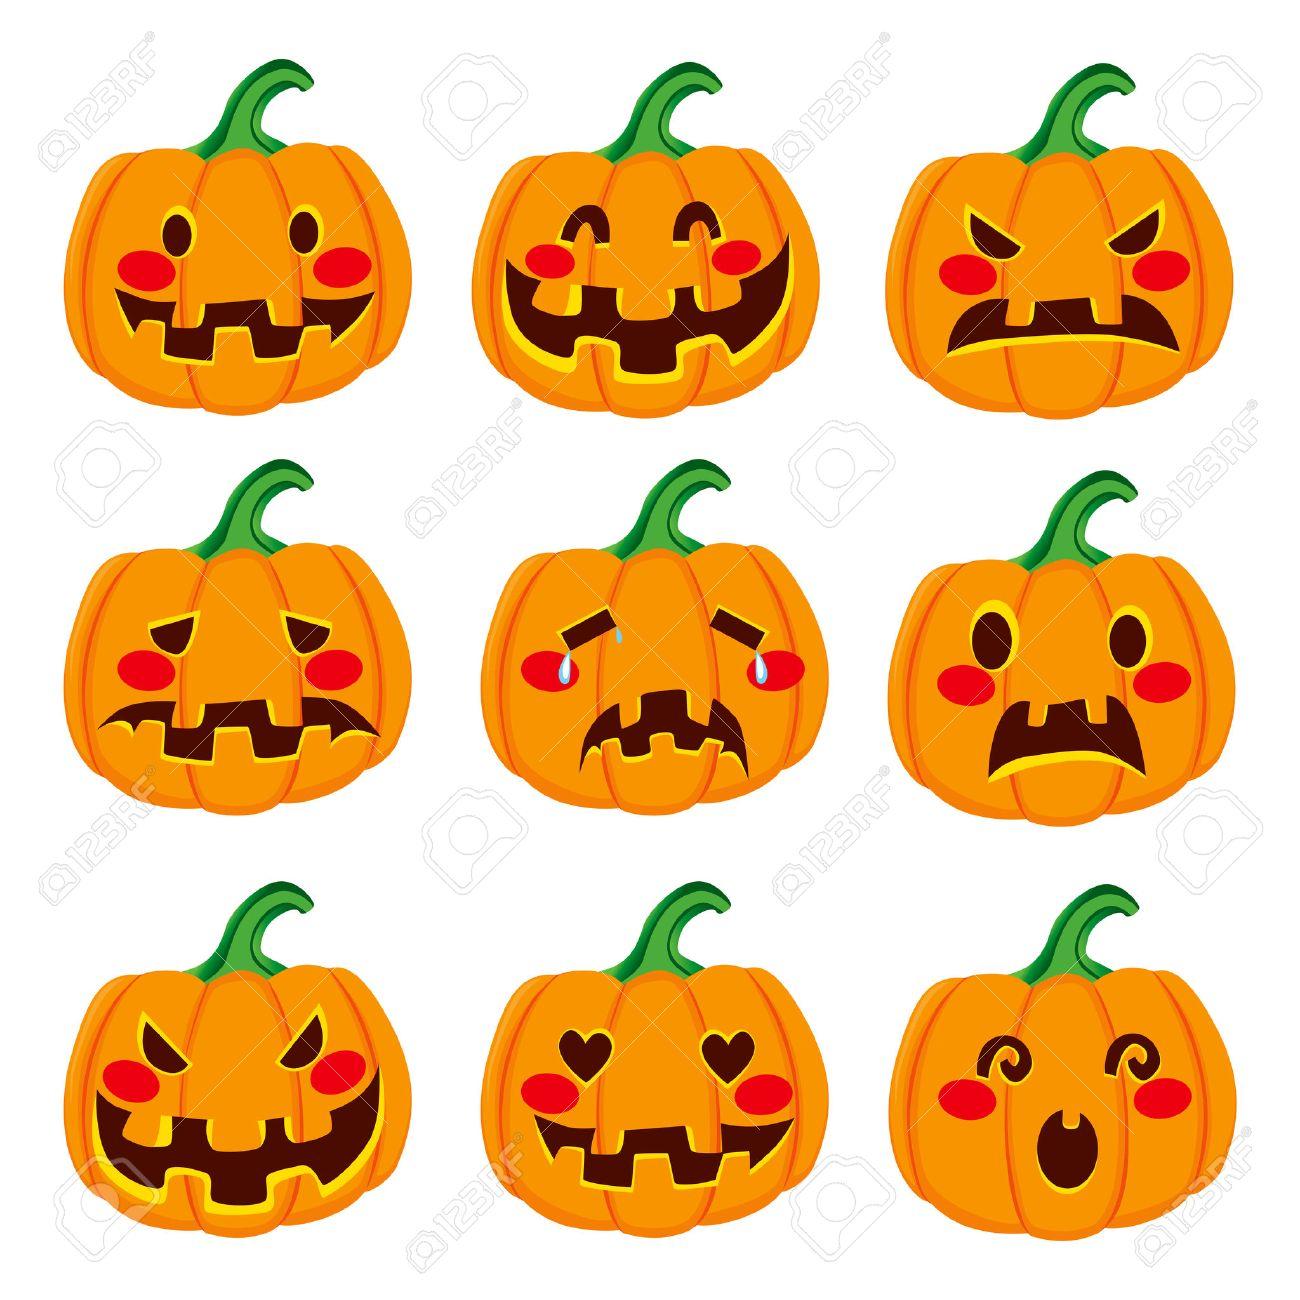 Cute Halloween Pumpkin Decoration Making Nine Different Funny ...